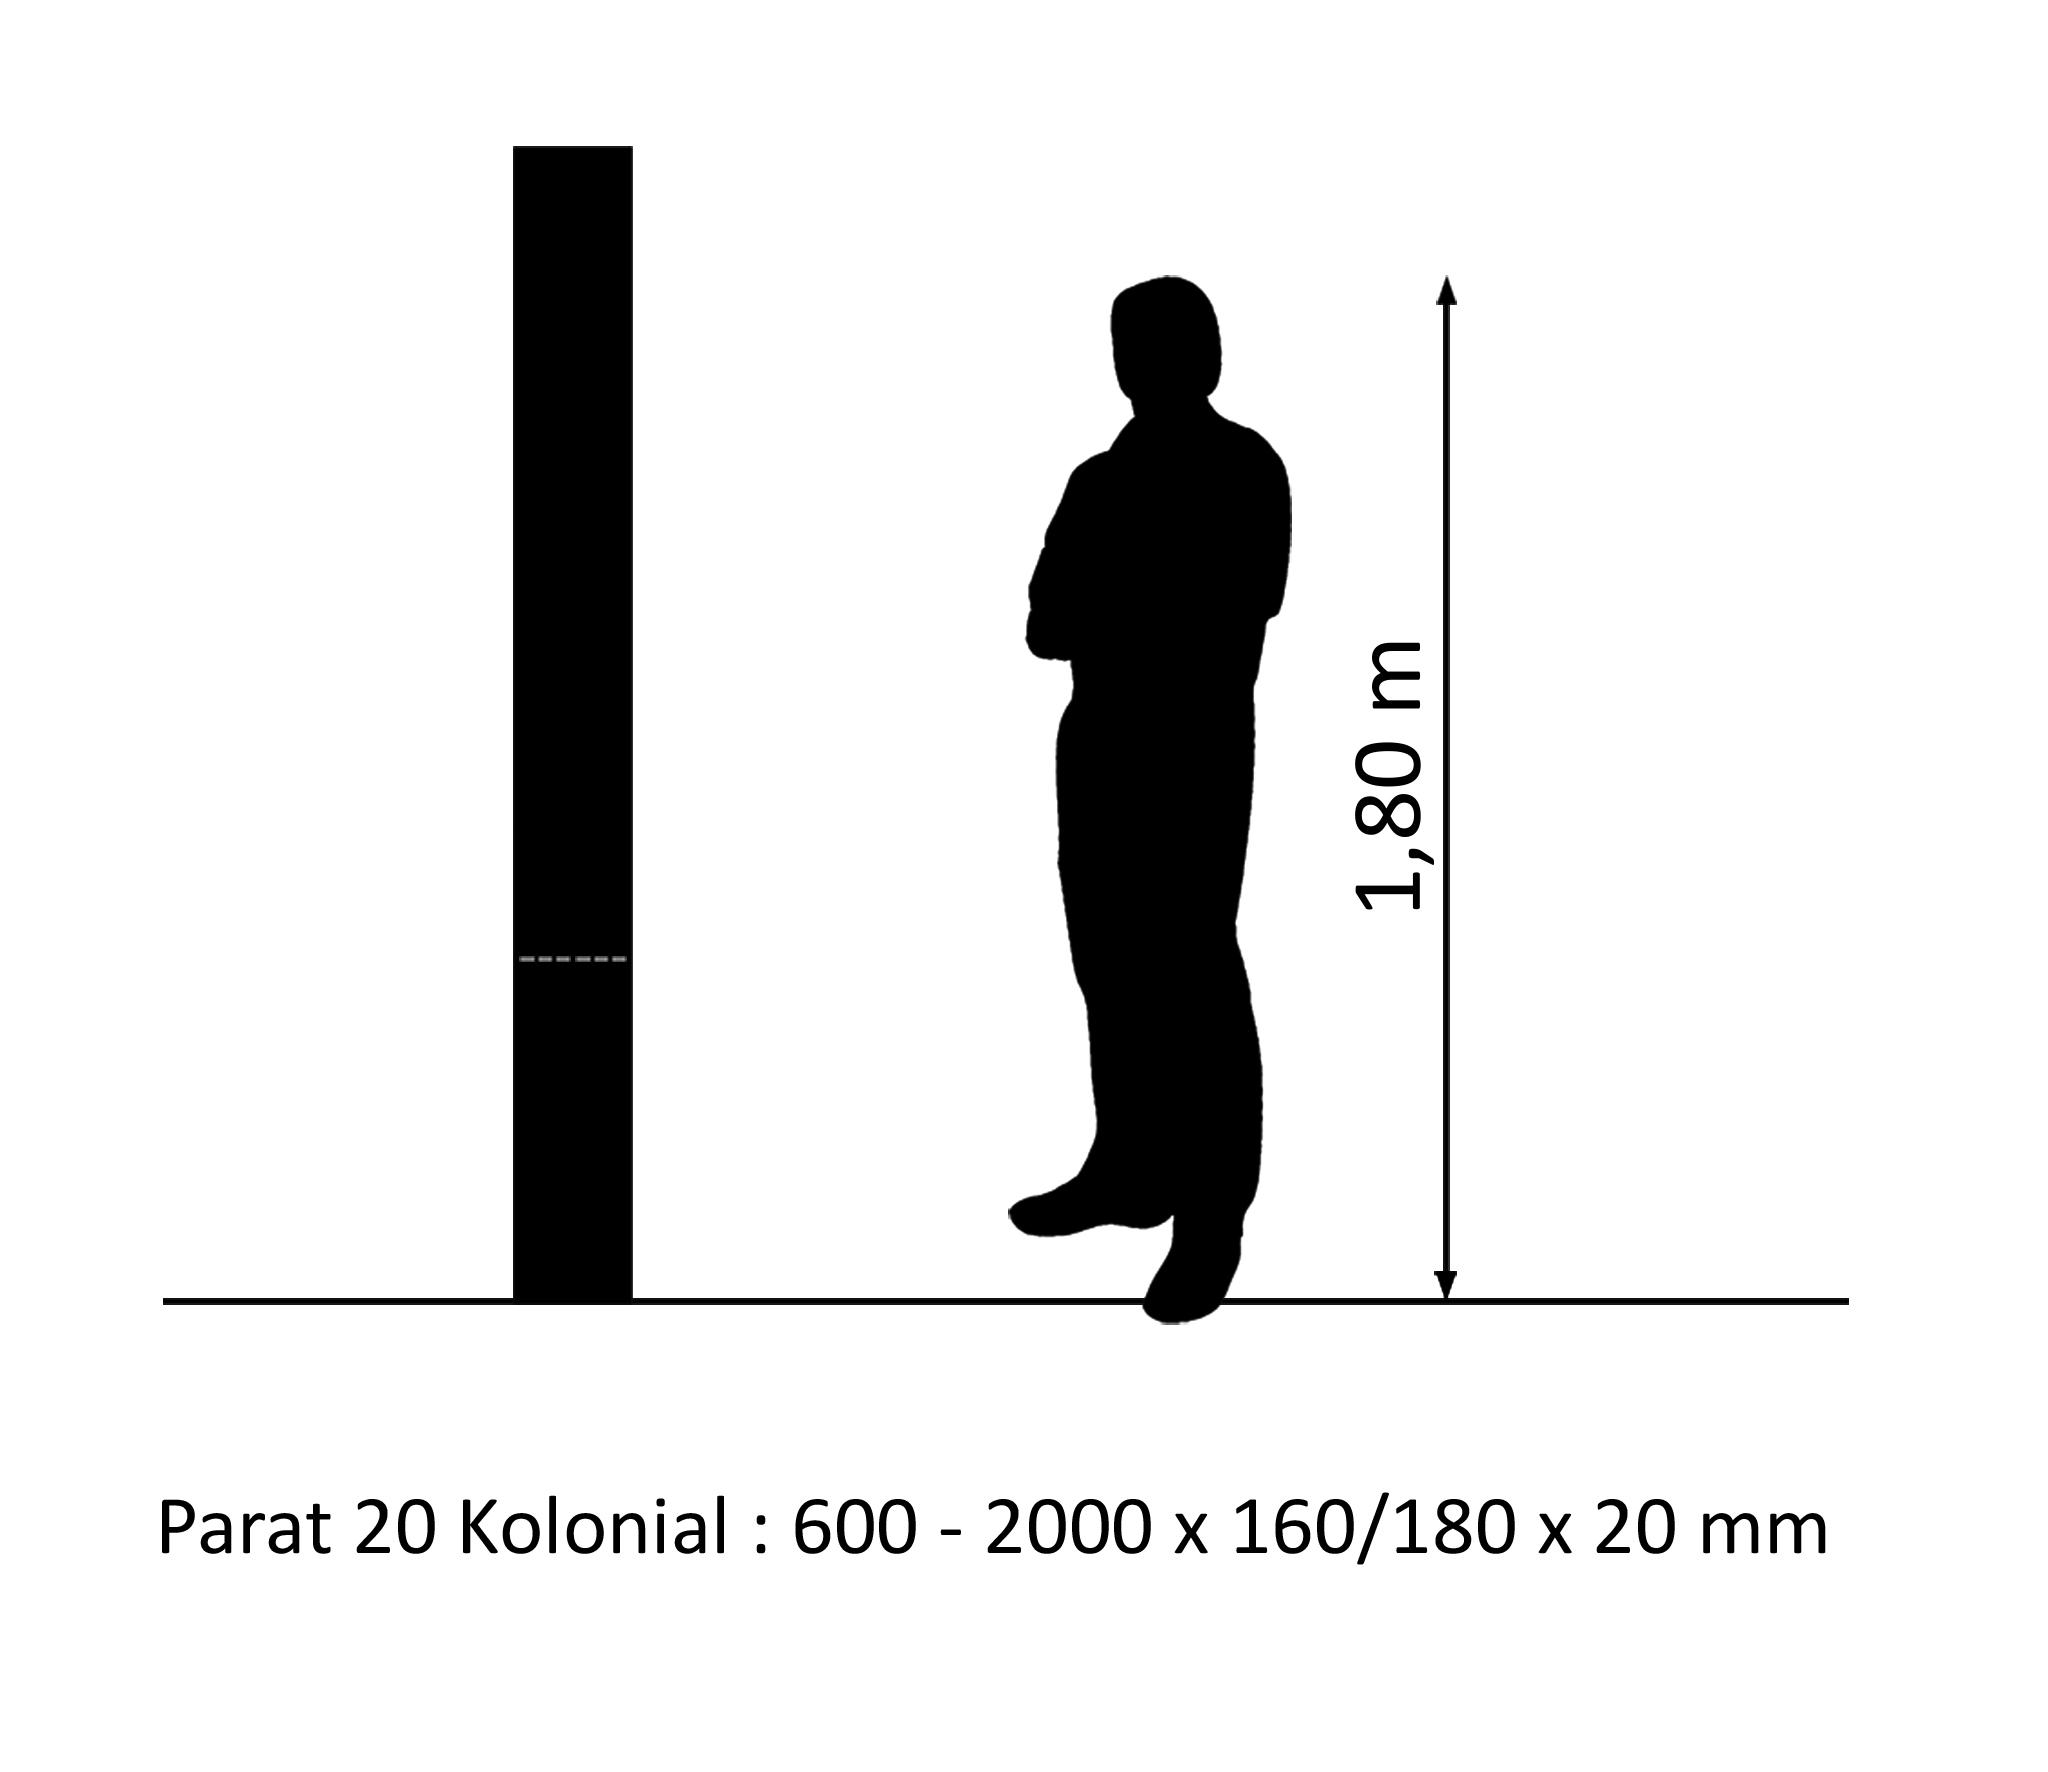 PARAT 20 kolonial oak Gotland 20mm